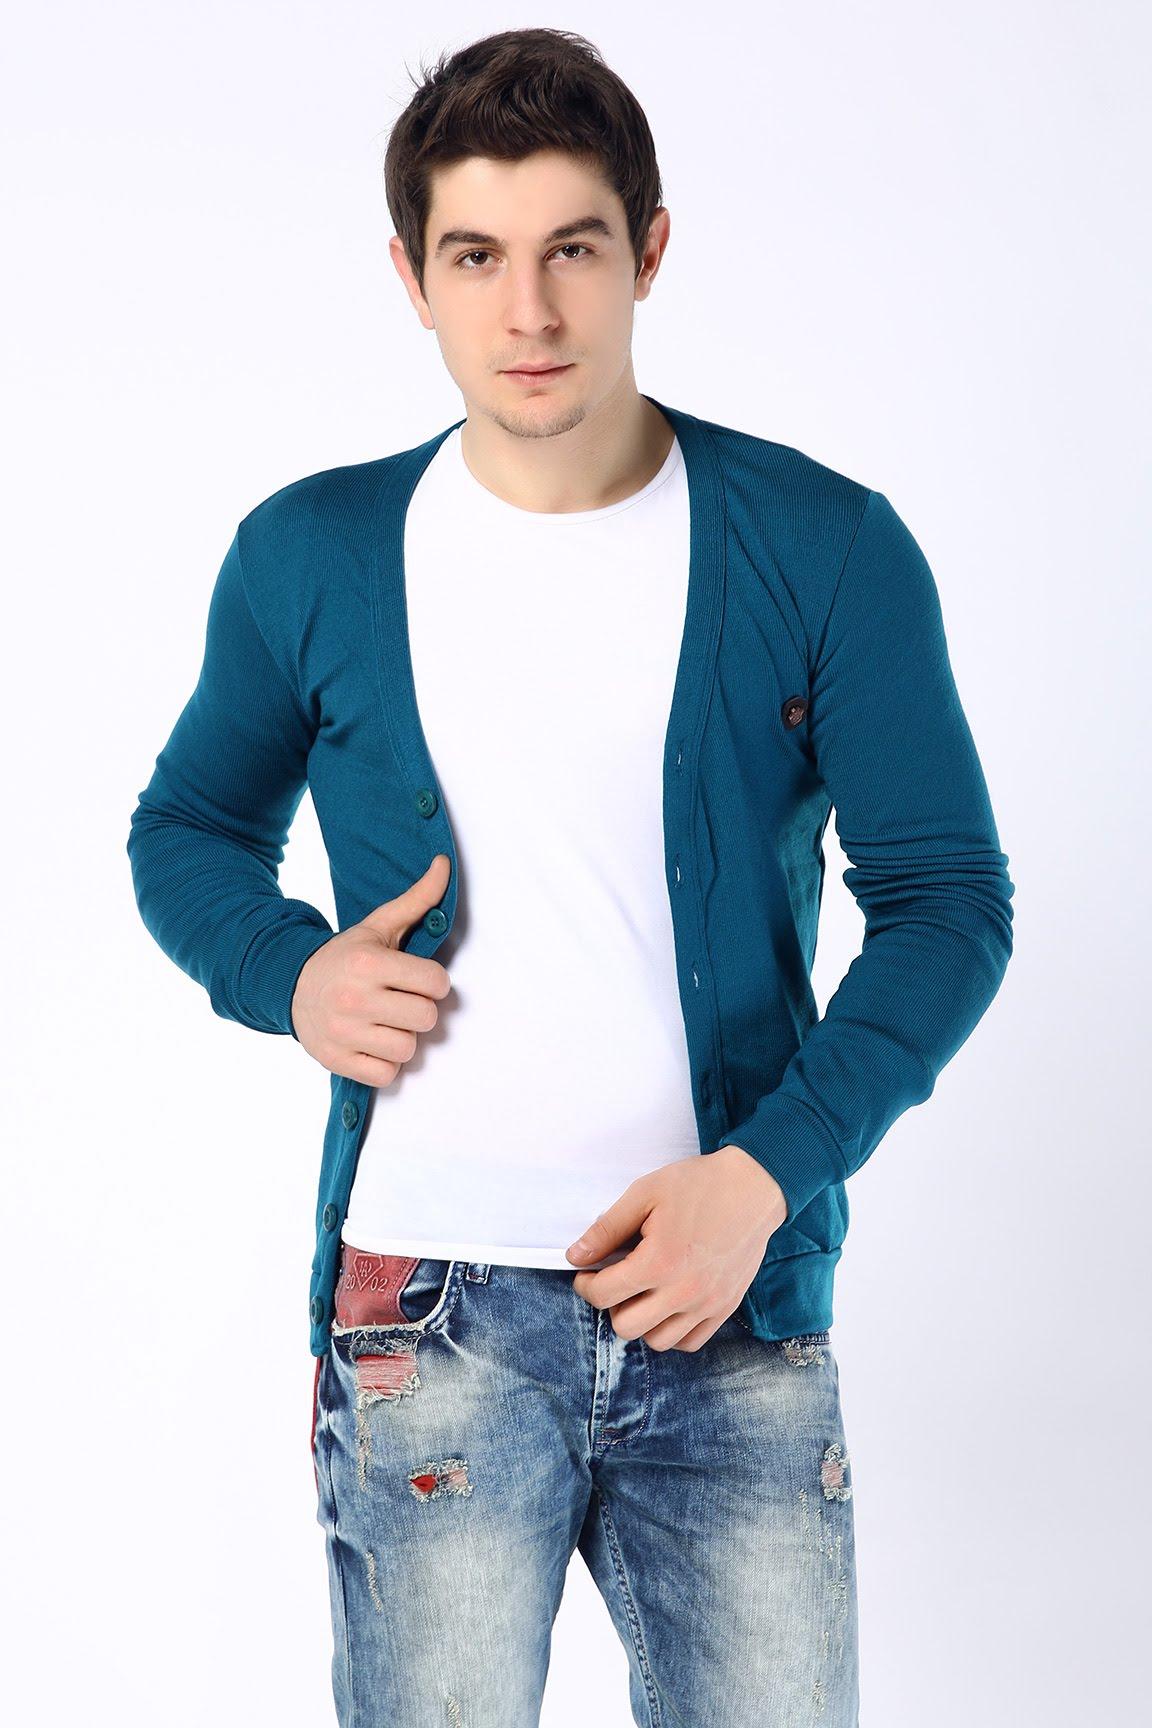 بالصور ملابس رجال , كيف اختار ملابس رجال 5211 8